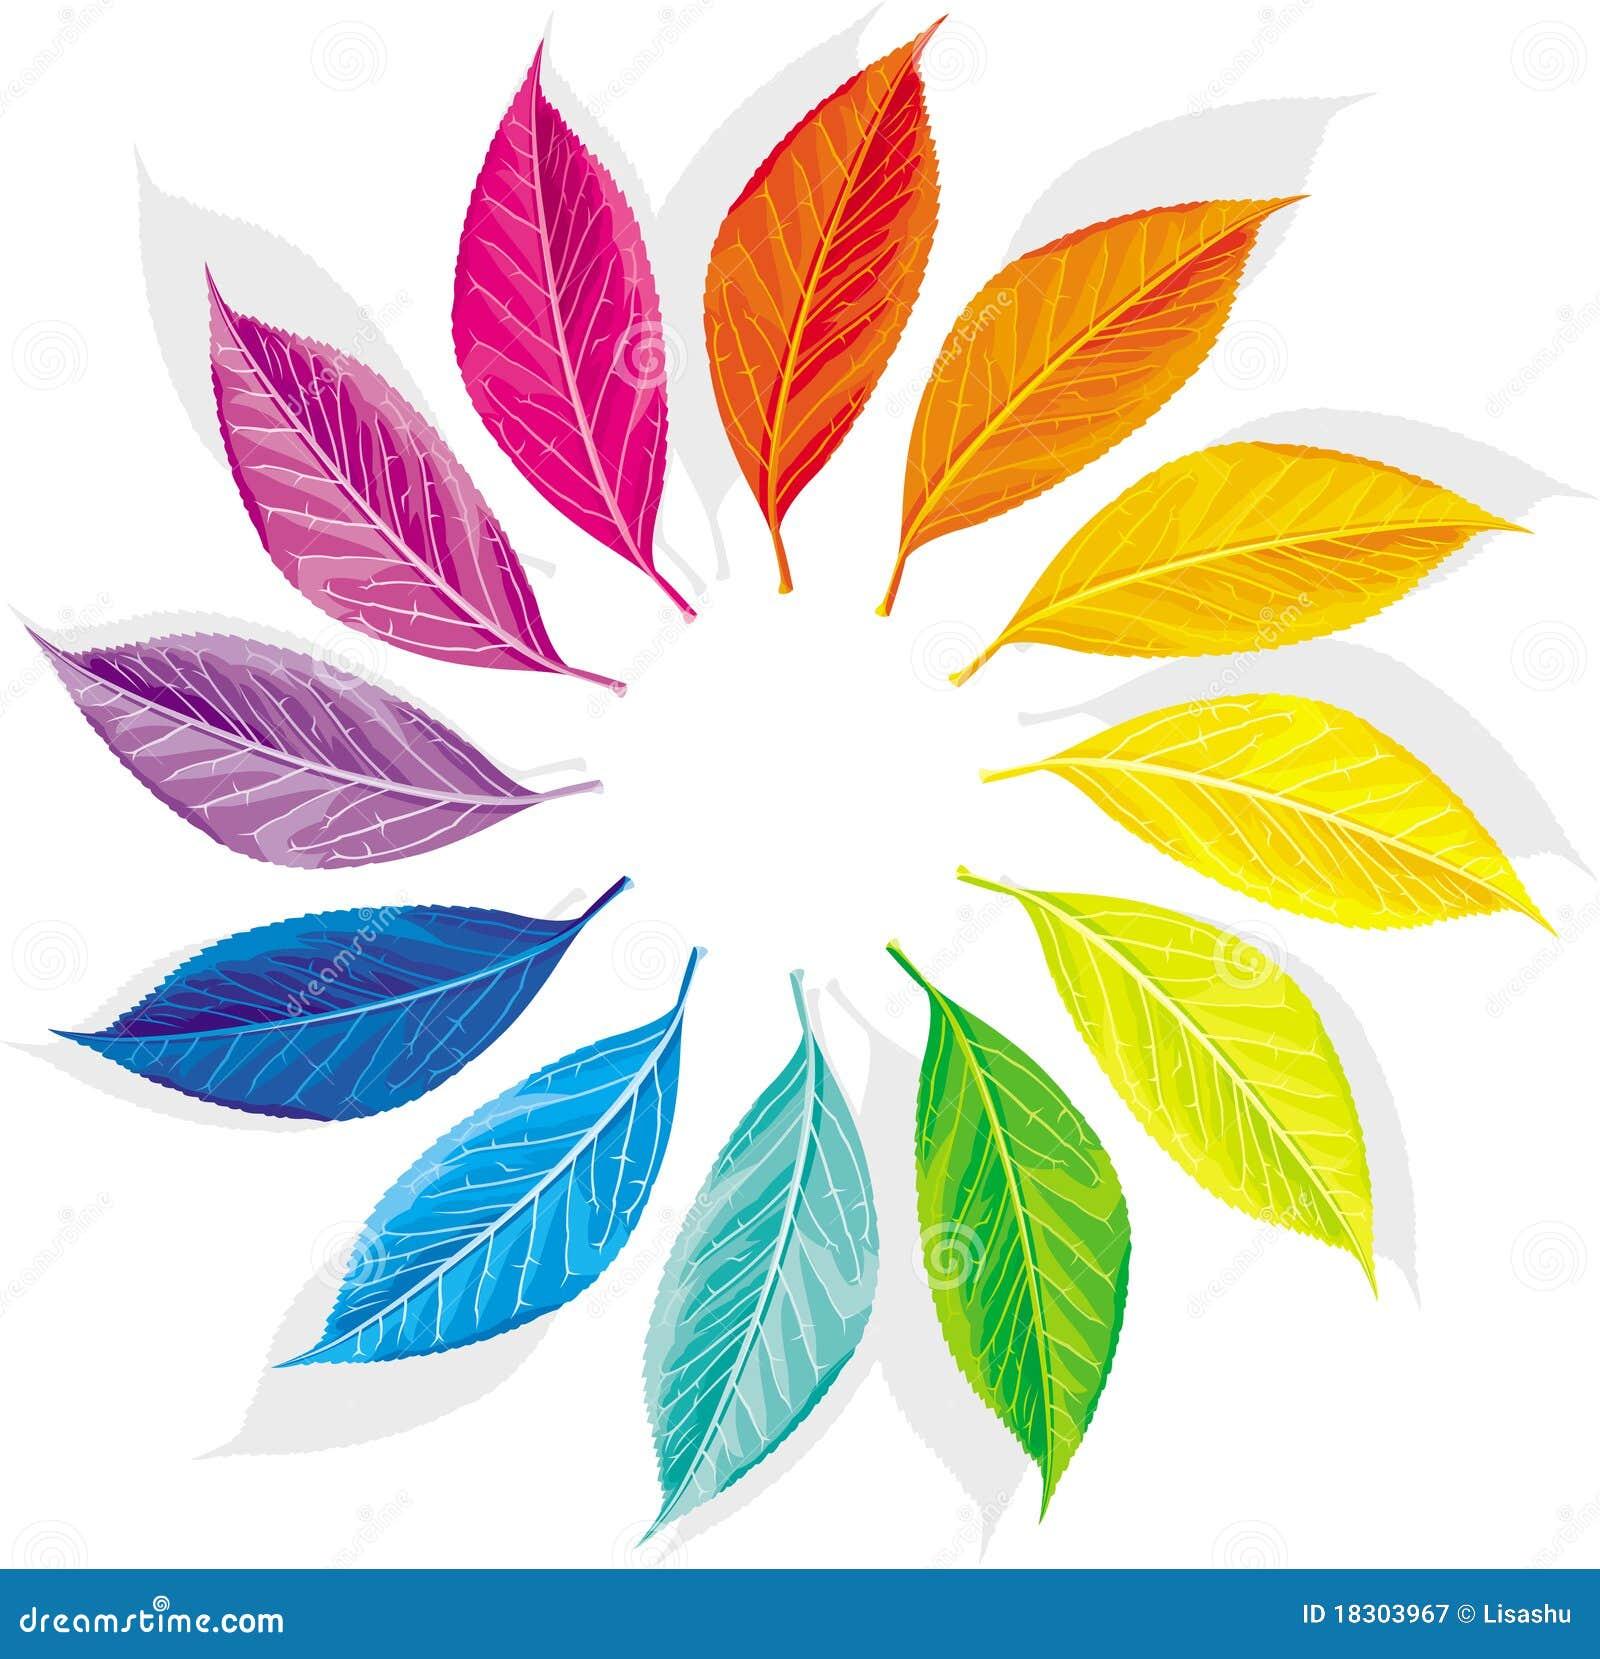 flower colour wheel template pdf